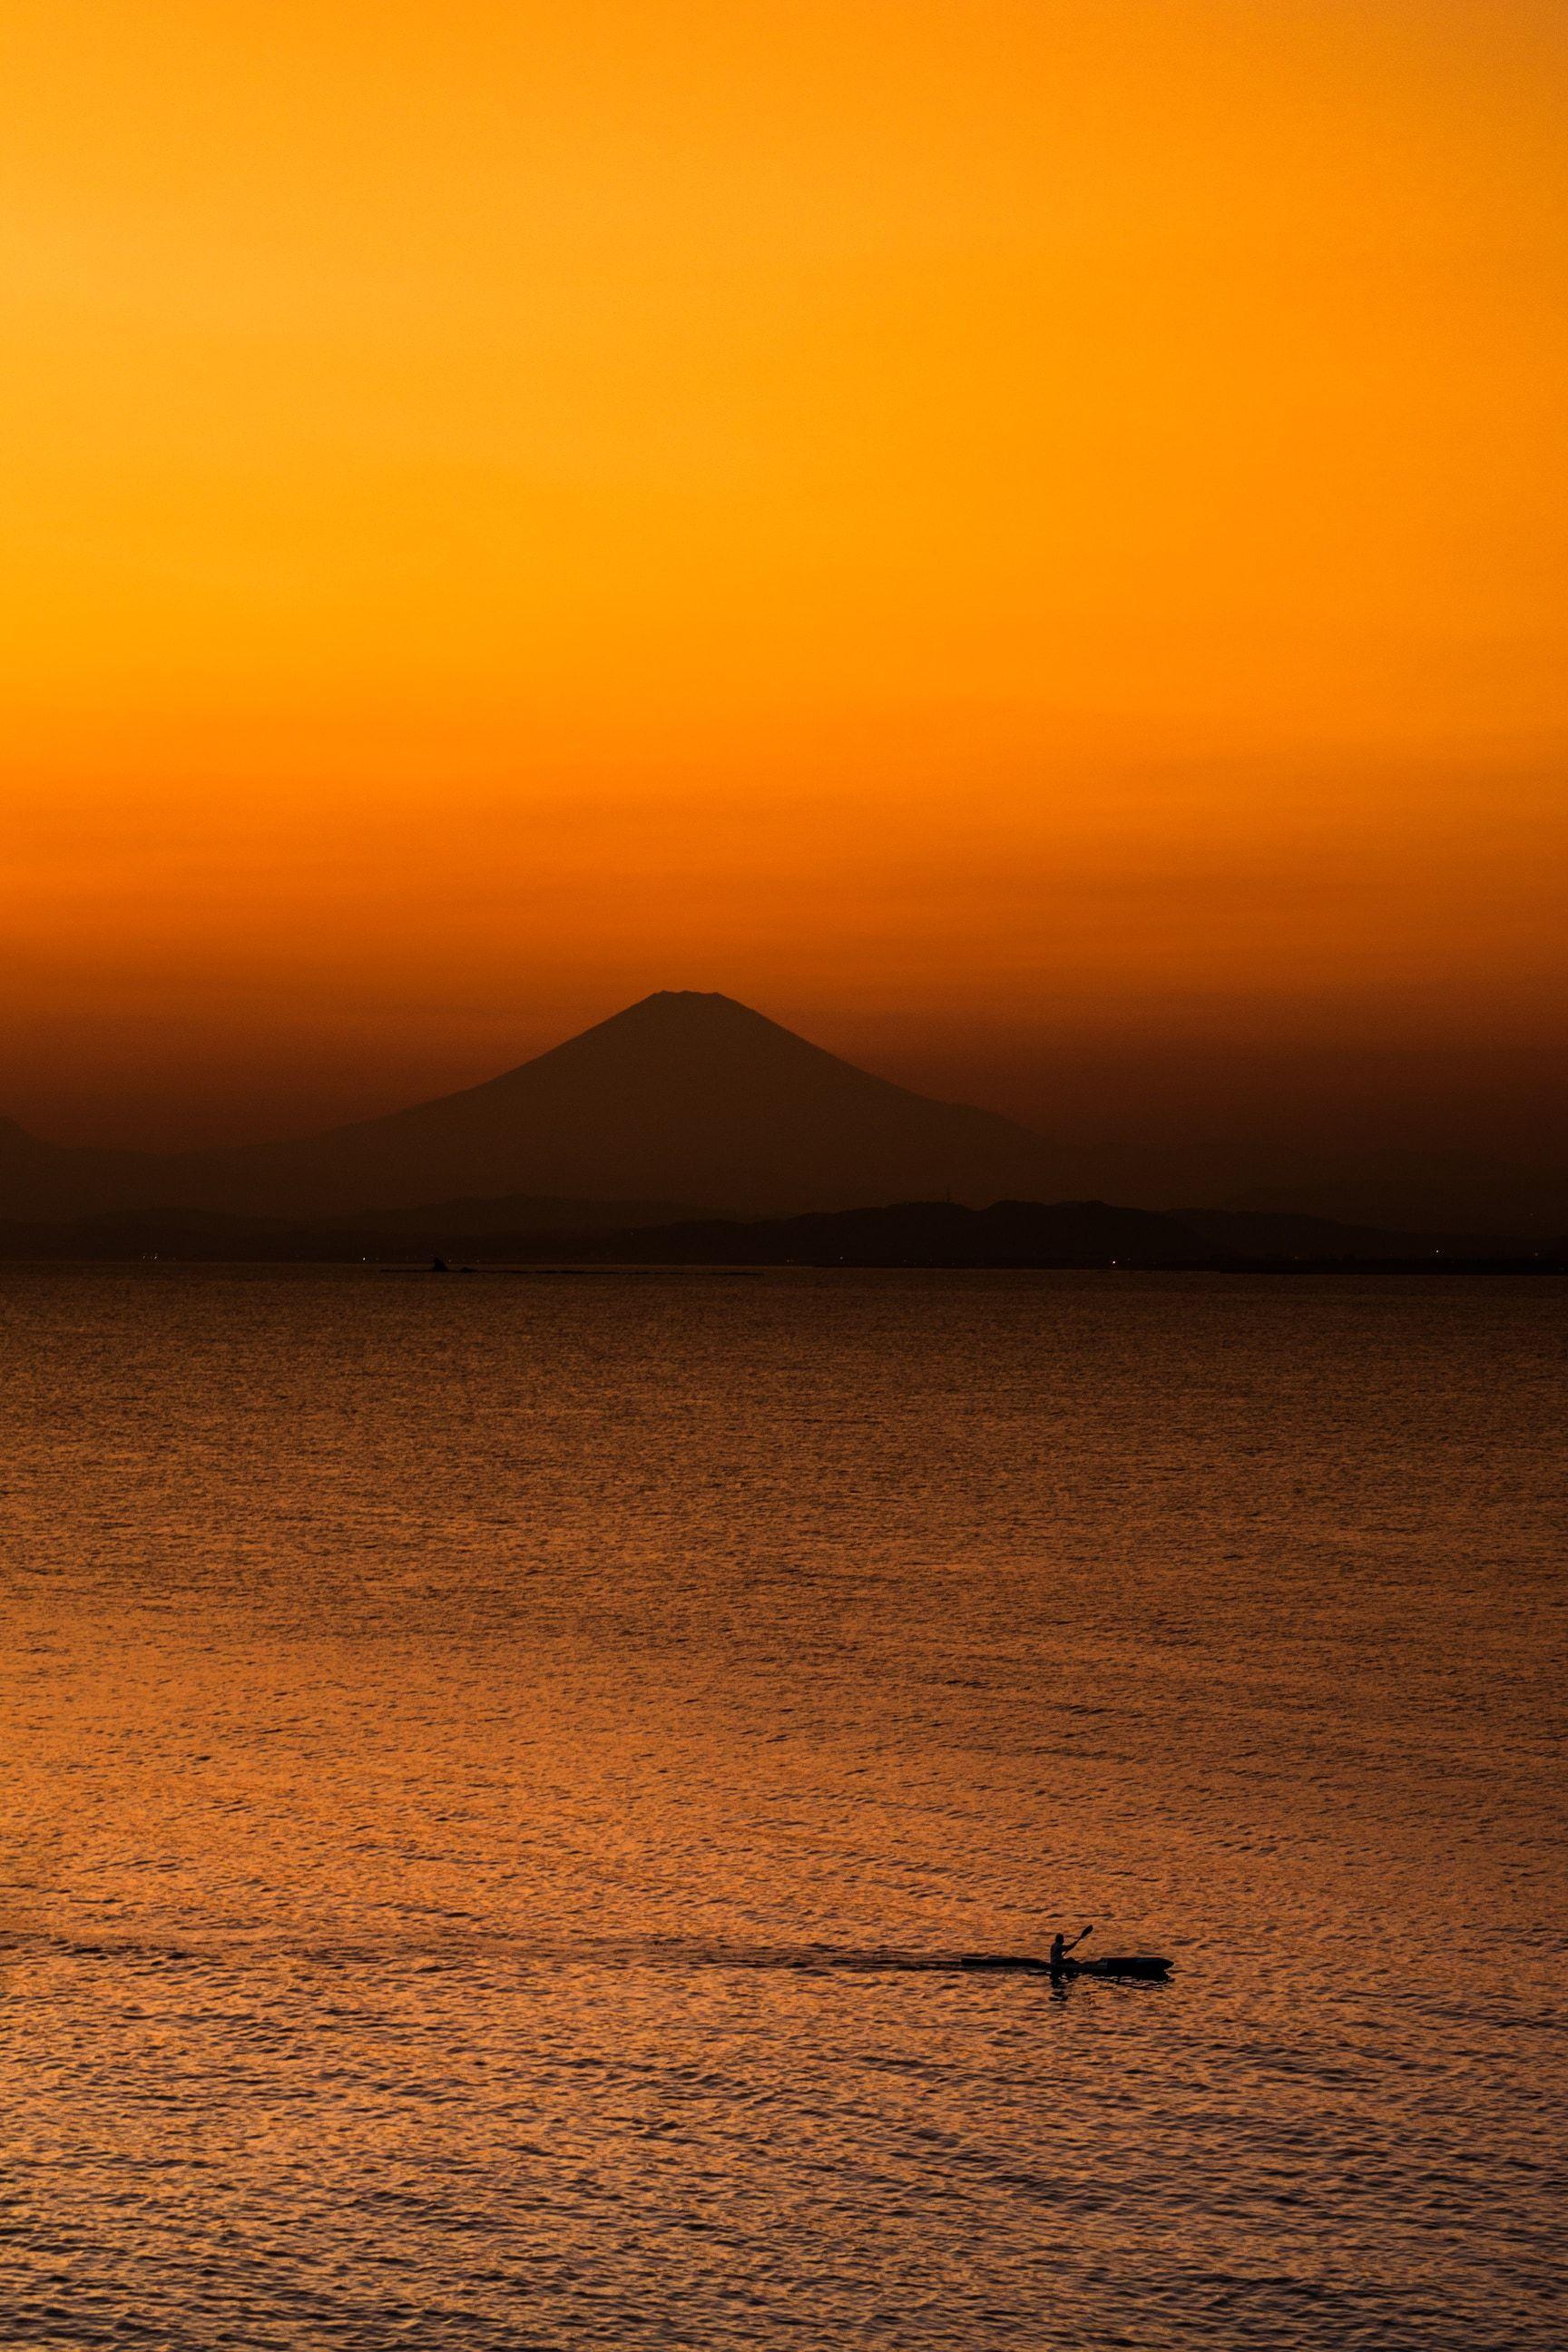 Photo by : George Yajima . Follow us for amazing posts! #PASHADELIC #FUJIdelic . . #ricoh #pentax #pentaxks1 #mtfuji #fujiyama #fujisan #富士山 #富士 #山 . #igers #ig_japan #japan #japan_of_insta #japanphoto #landscape #landscapephotography #mountain #mountains #mountainphotography #nature #naturephotography #photography #photooftheday